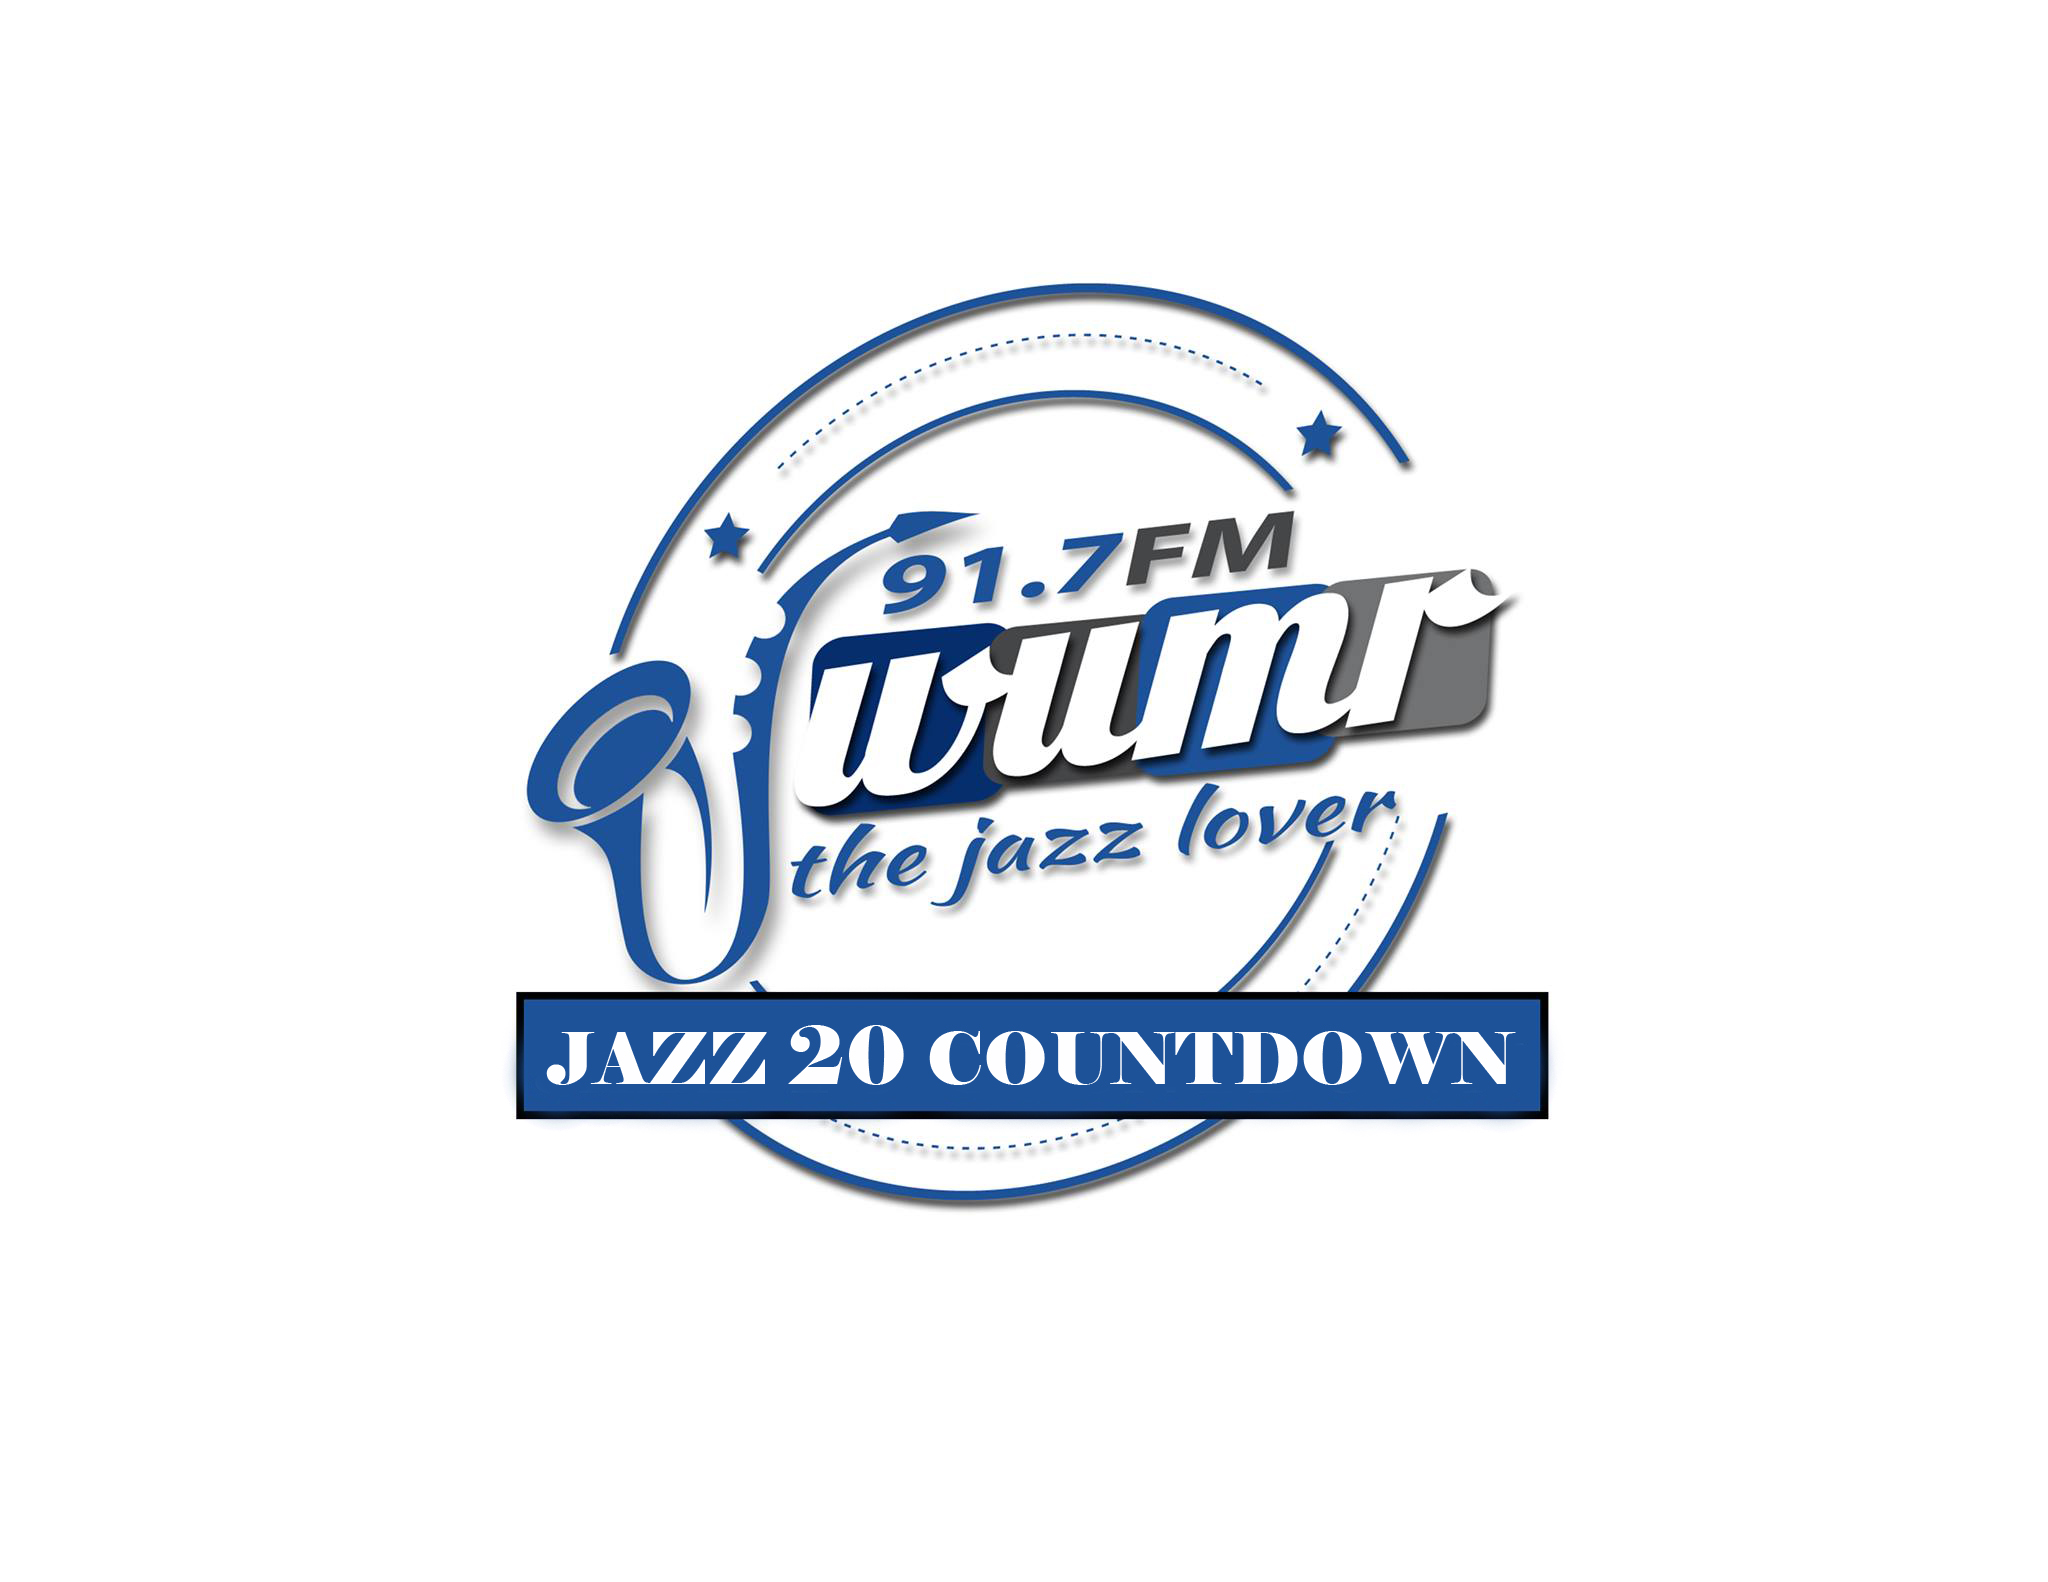 Jazz 20 Countdown